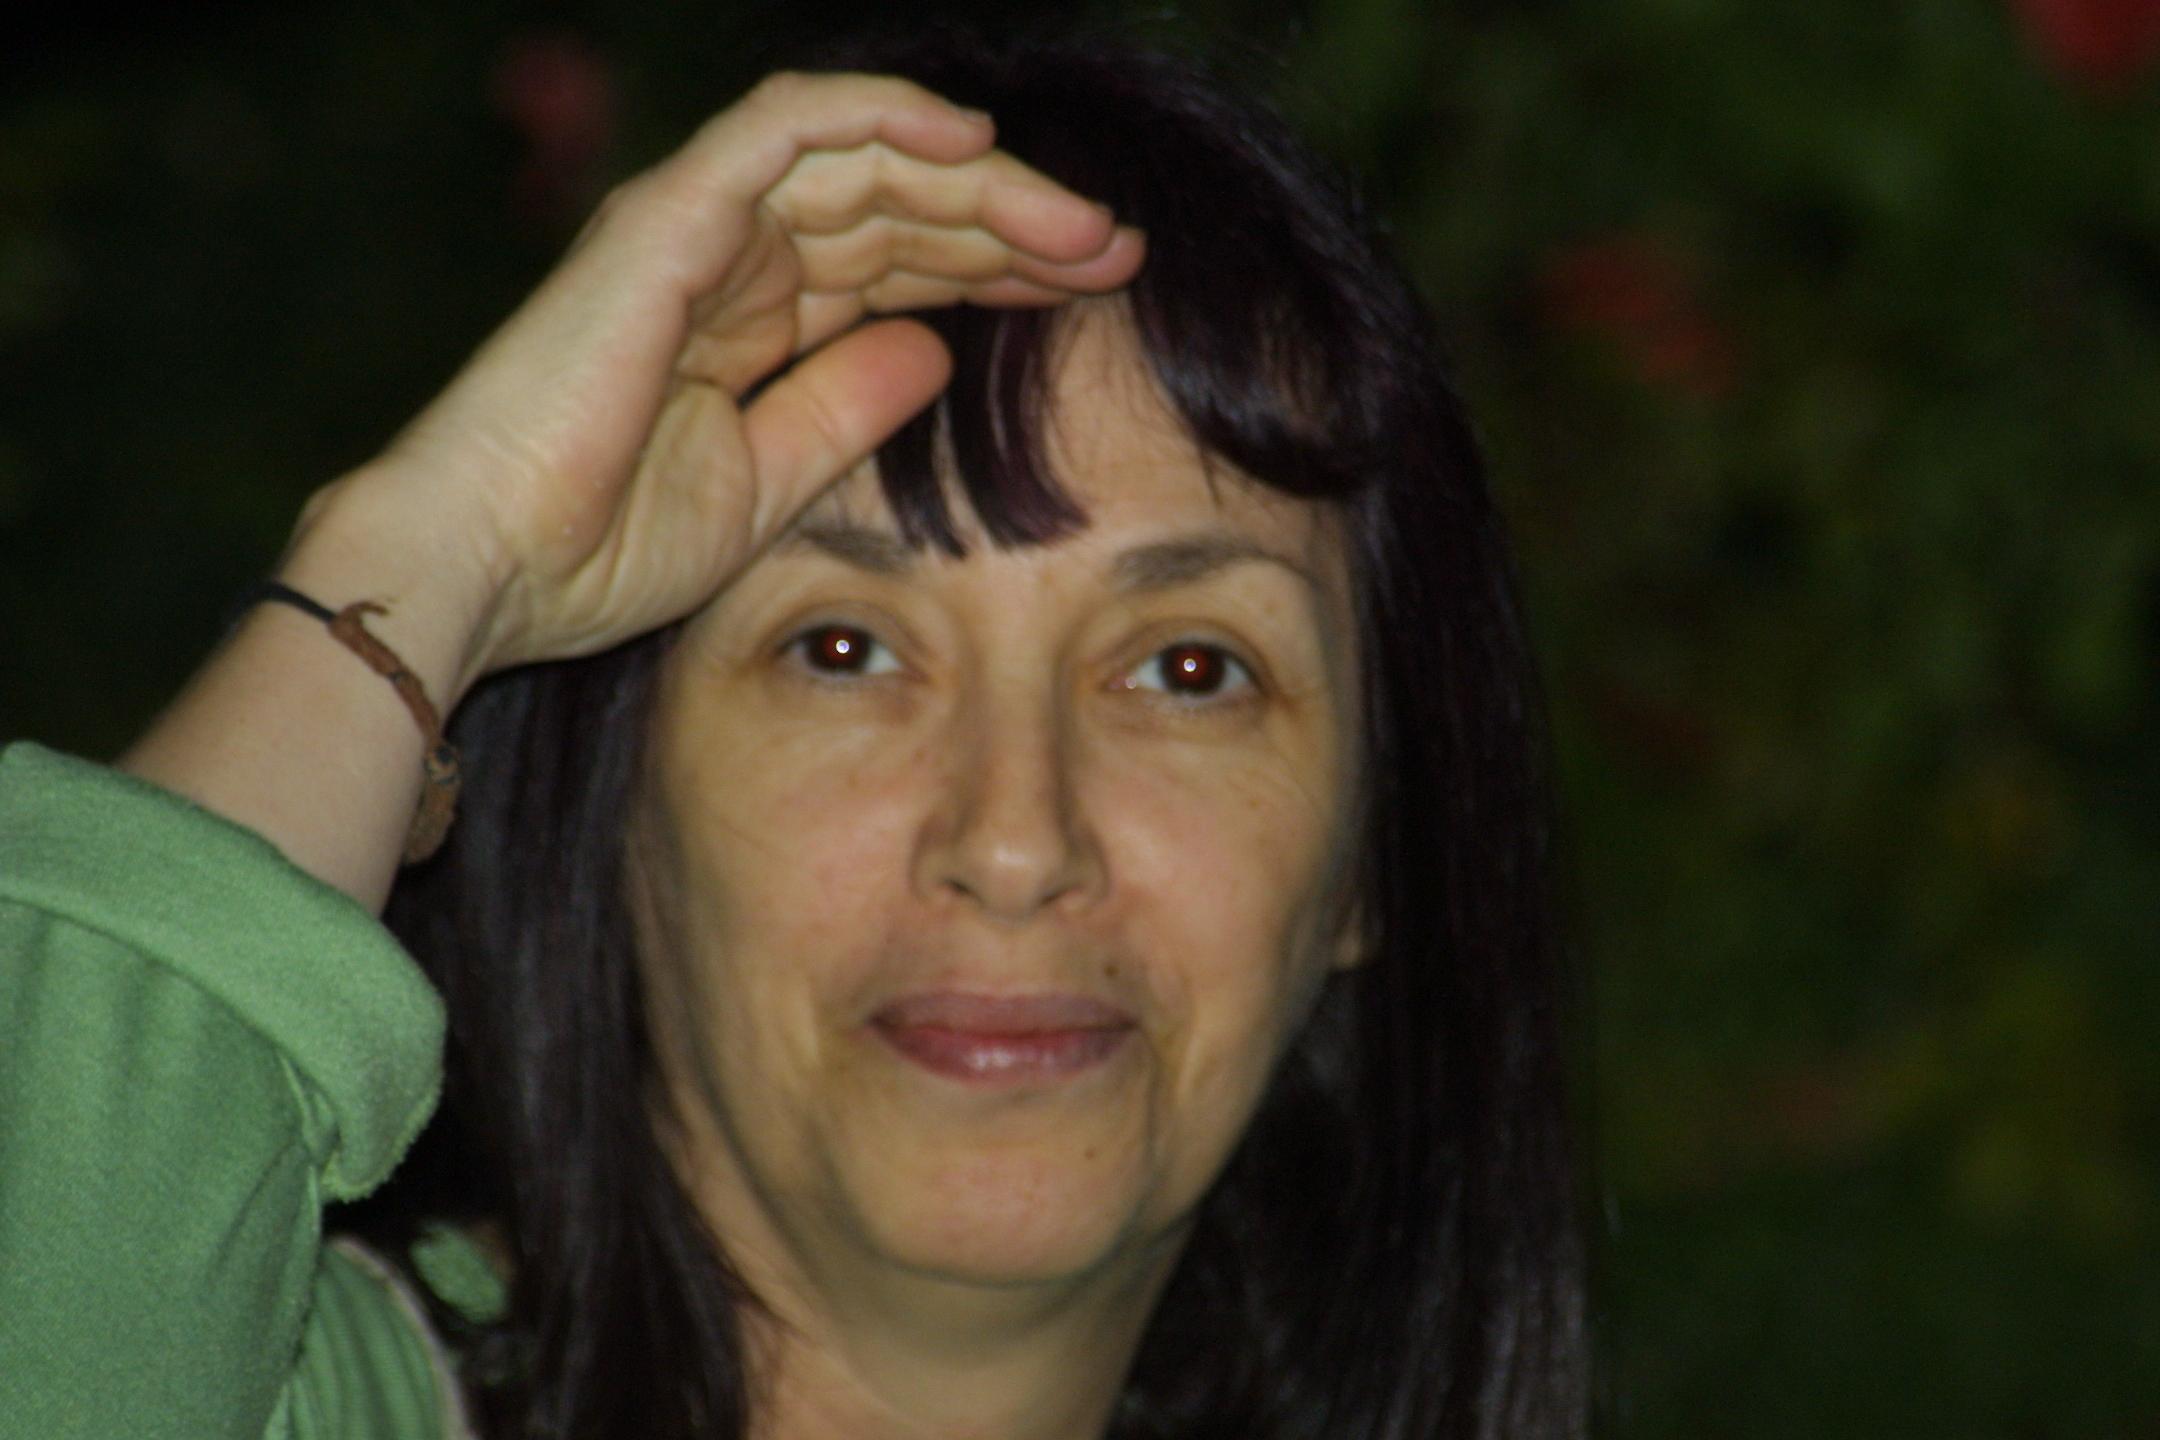 Mayi Cahmbeau